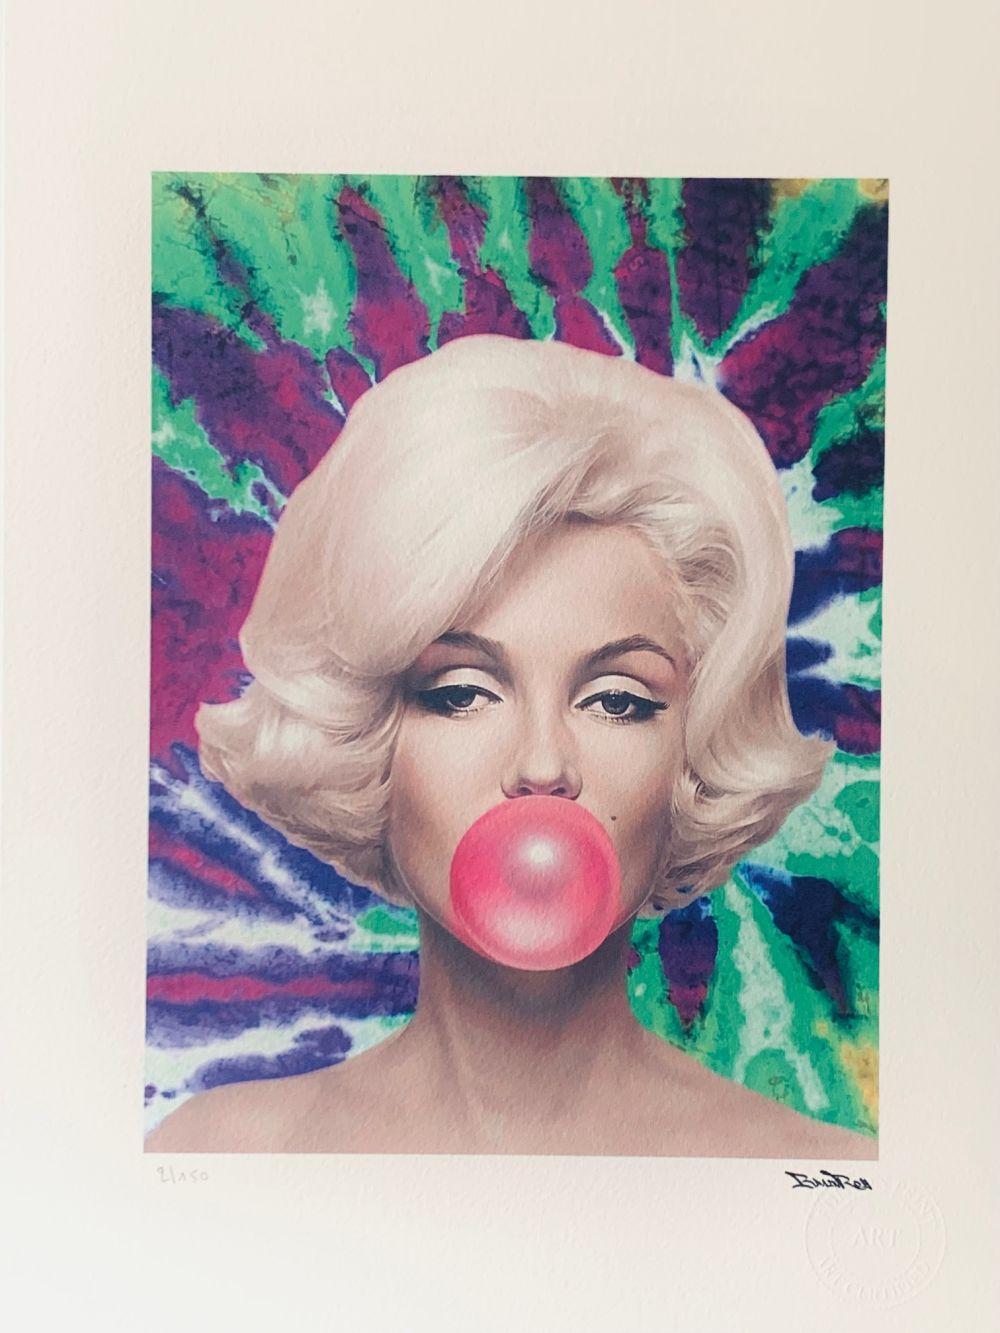 "BrainRoy (né en 1980) ""Marilyn Ballon, Tie and dye, Green and purple"" Lithographie polychrome numér"